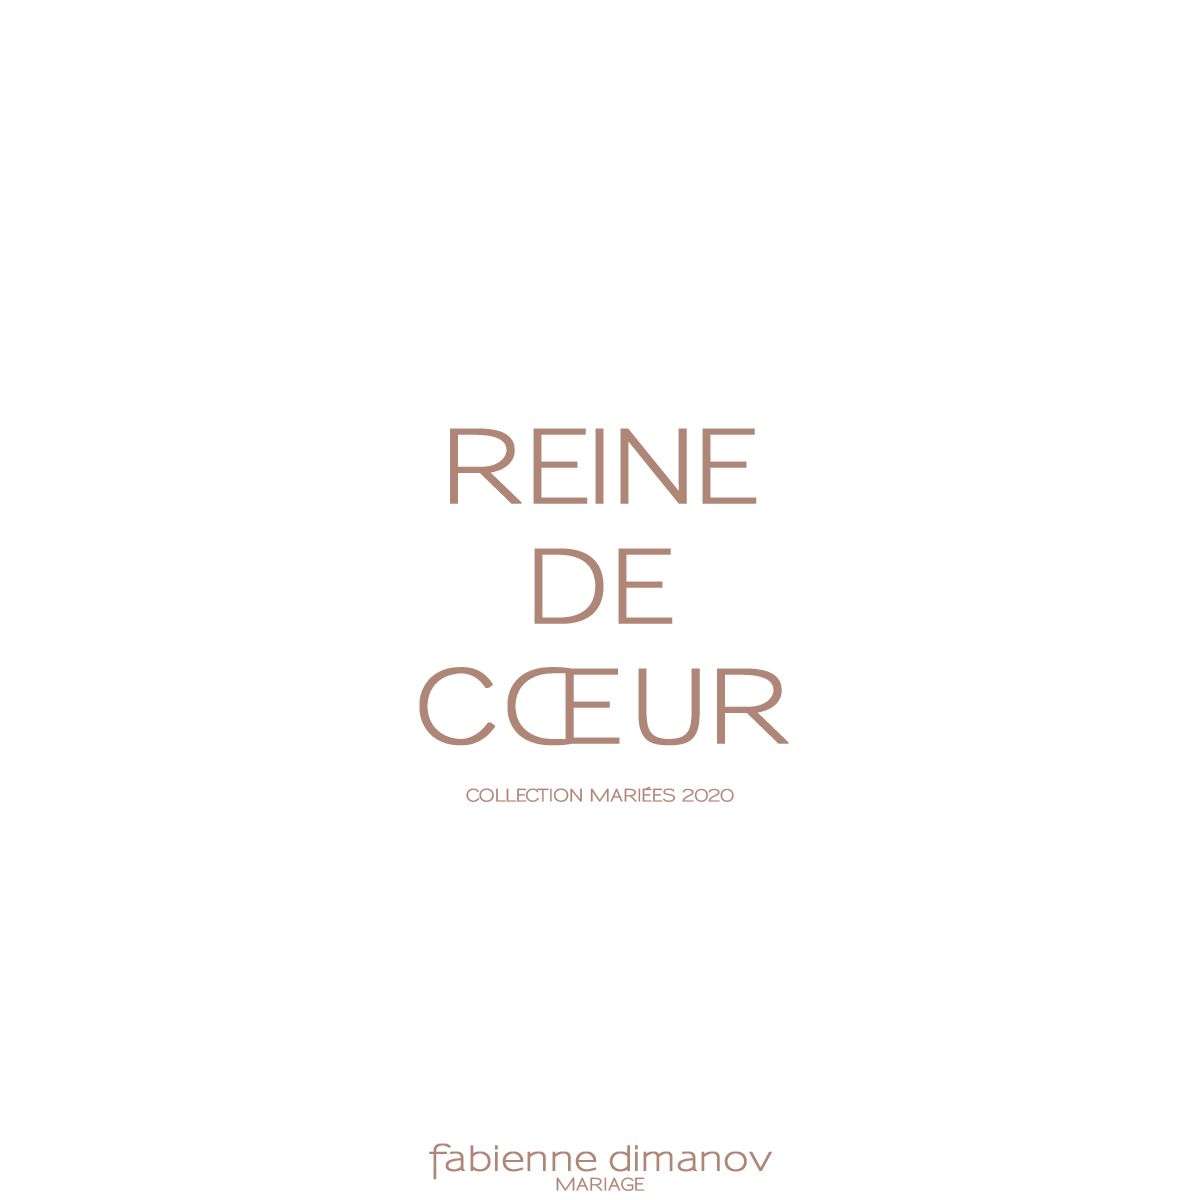 REINE DE COEUR - collection mariées 2020 - Fabienne Dimanov Mariage